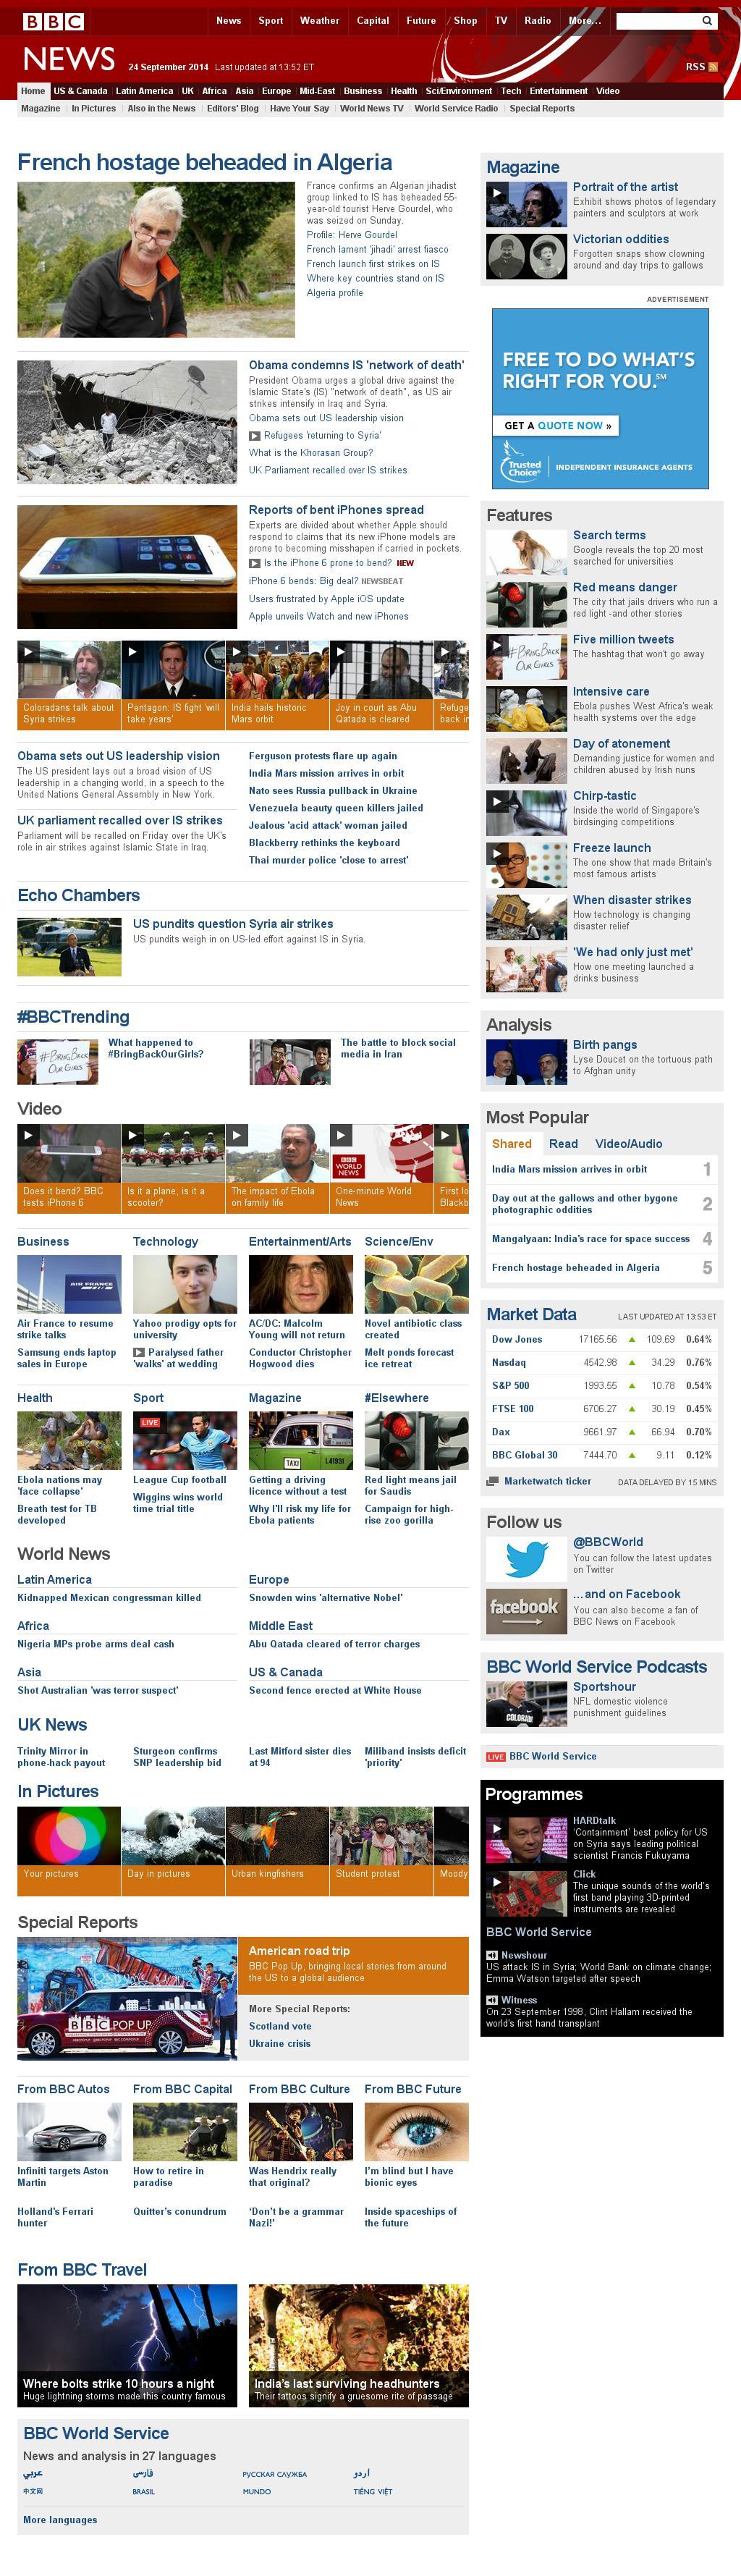 BBC at Wednesday Sept. 24, 2014, 6 p.m. UTC